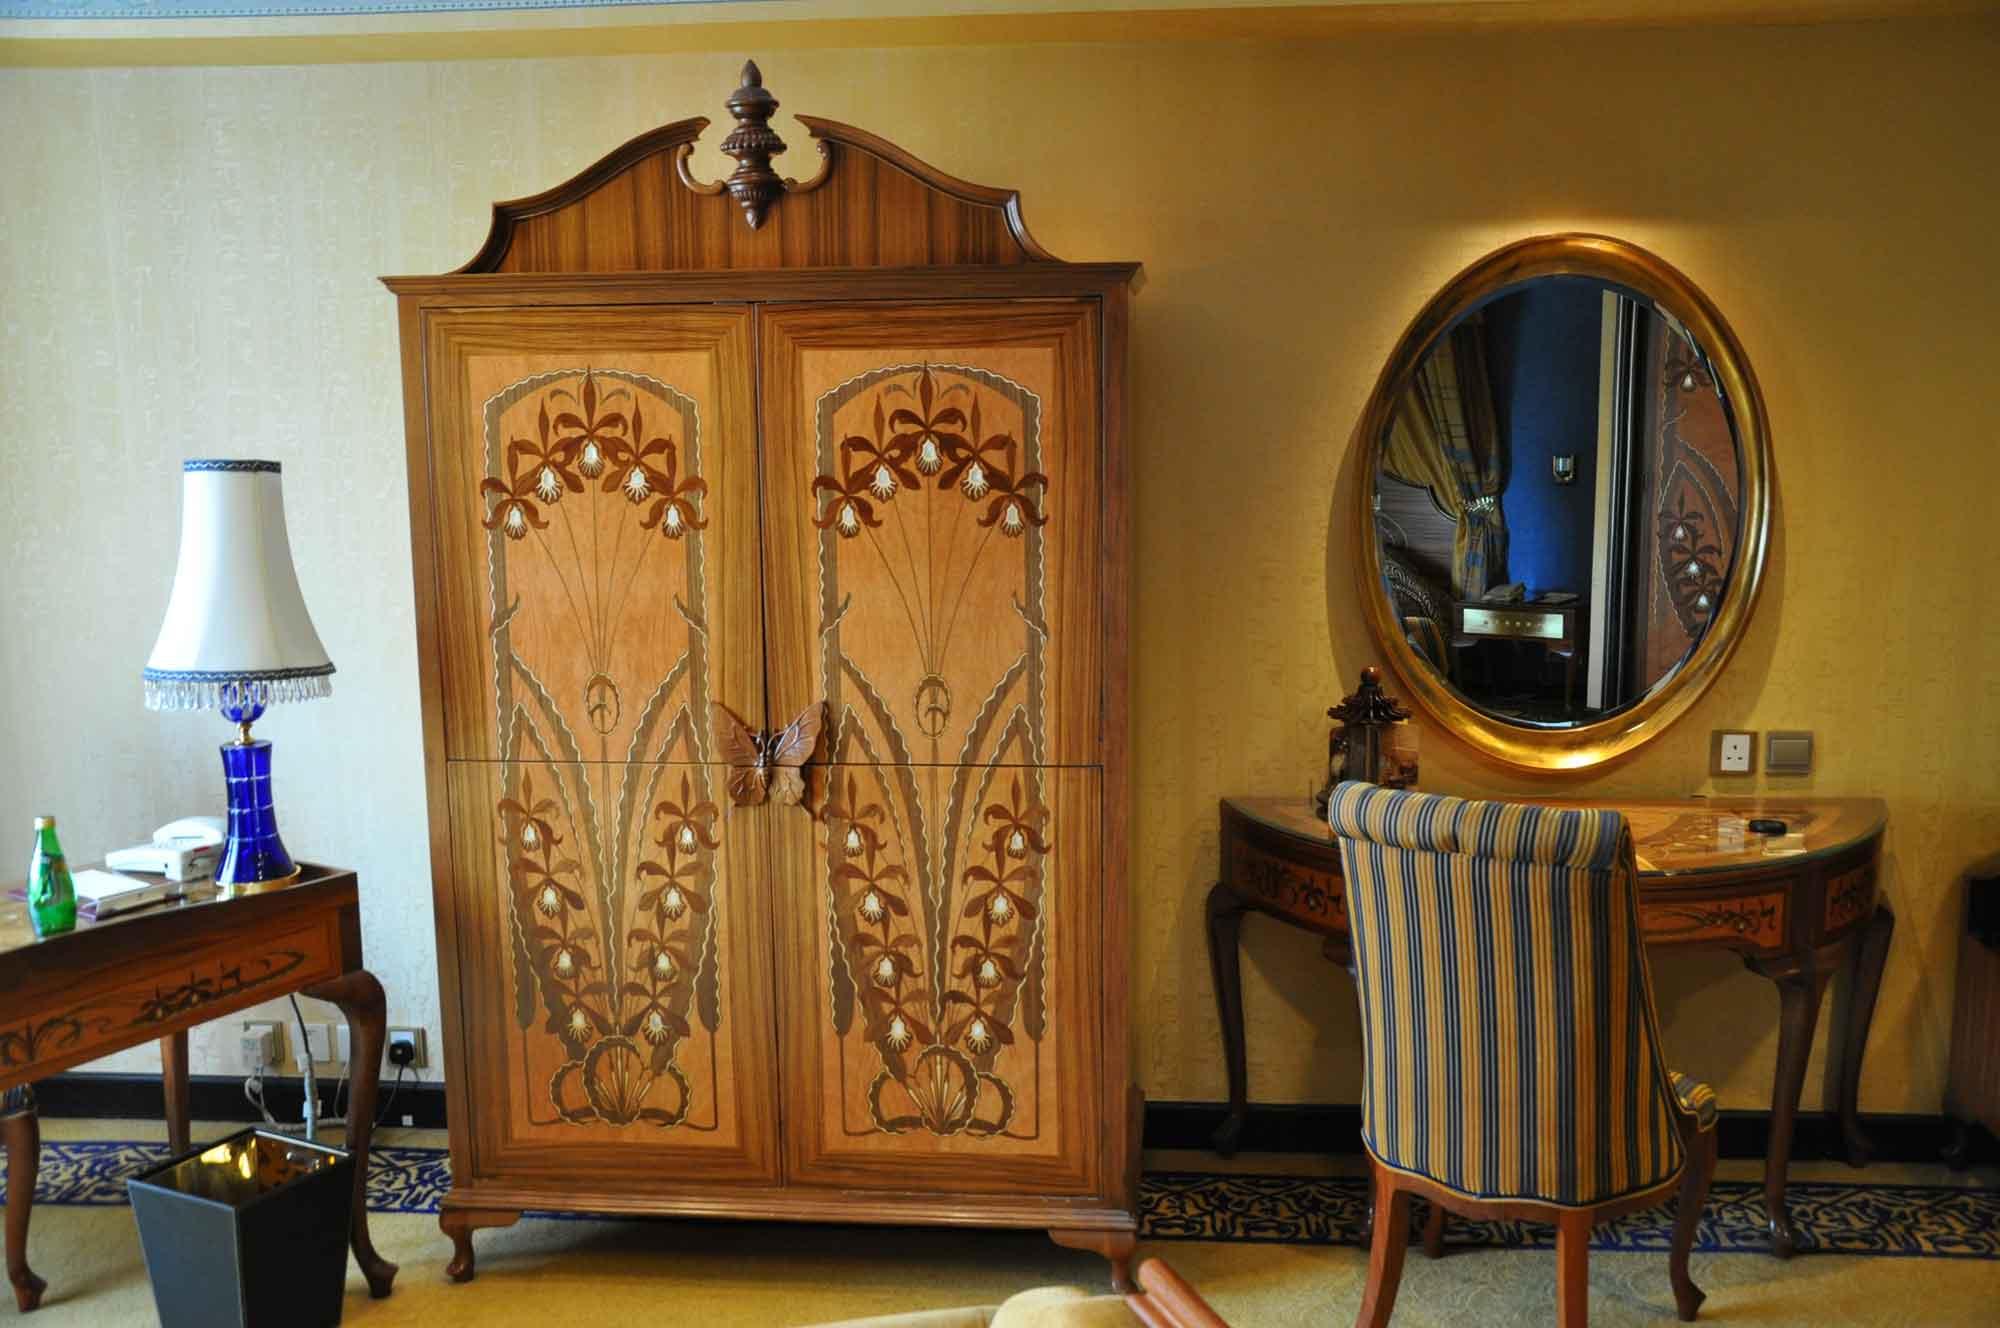 Hotel Lisboa Royal Tower Suite cabinet and desk